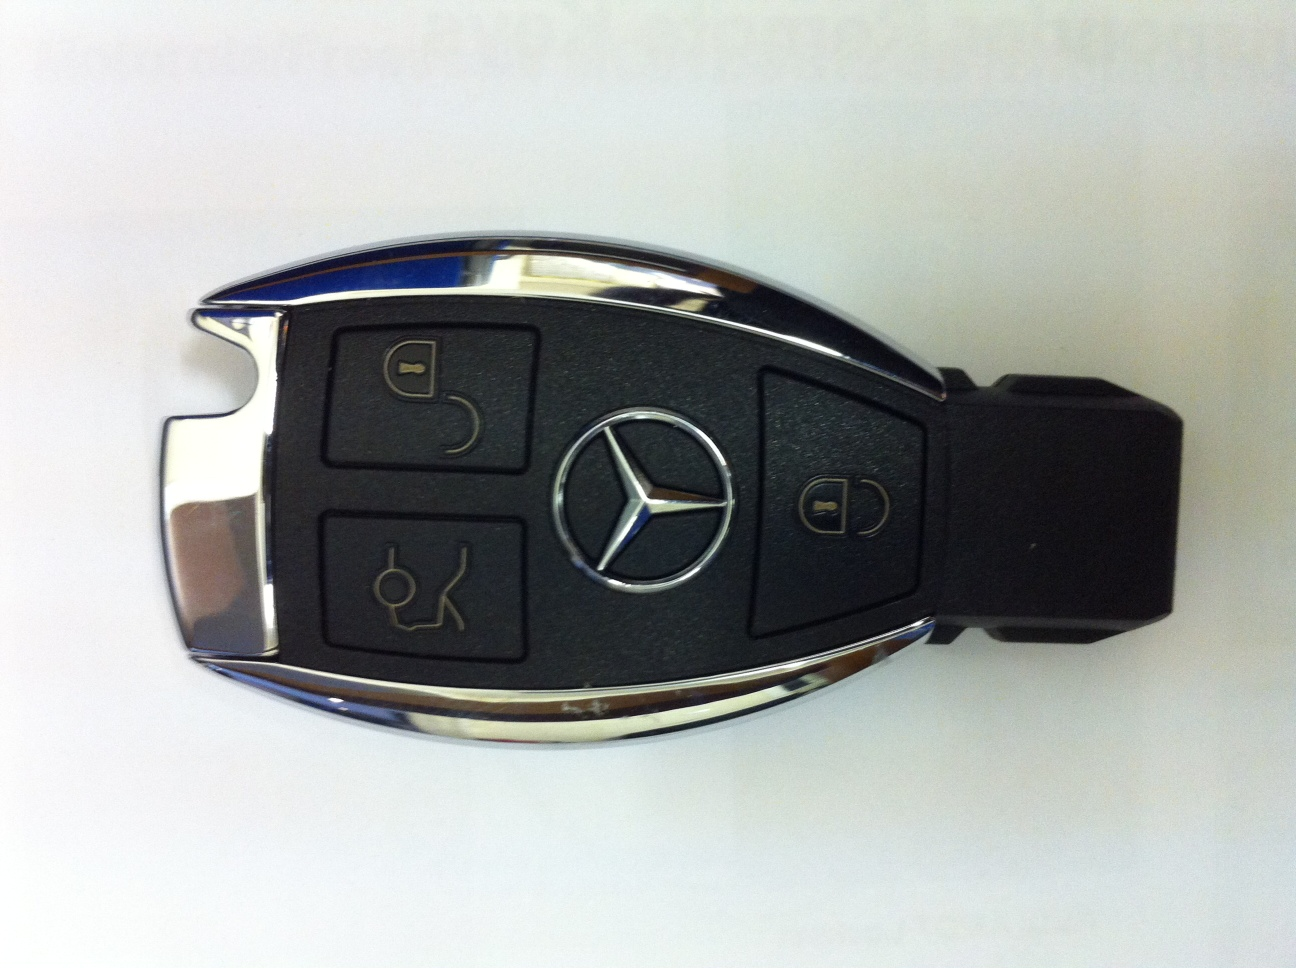 Volkswagen audi group software for car diagnostic vag for Key for mercedes benz cost